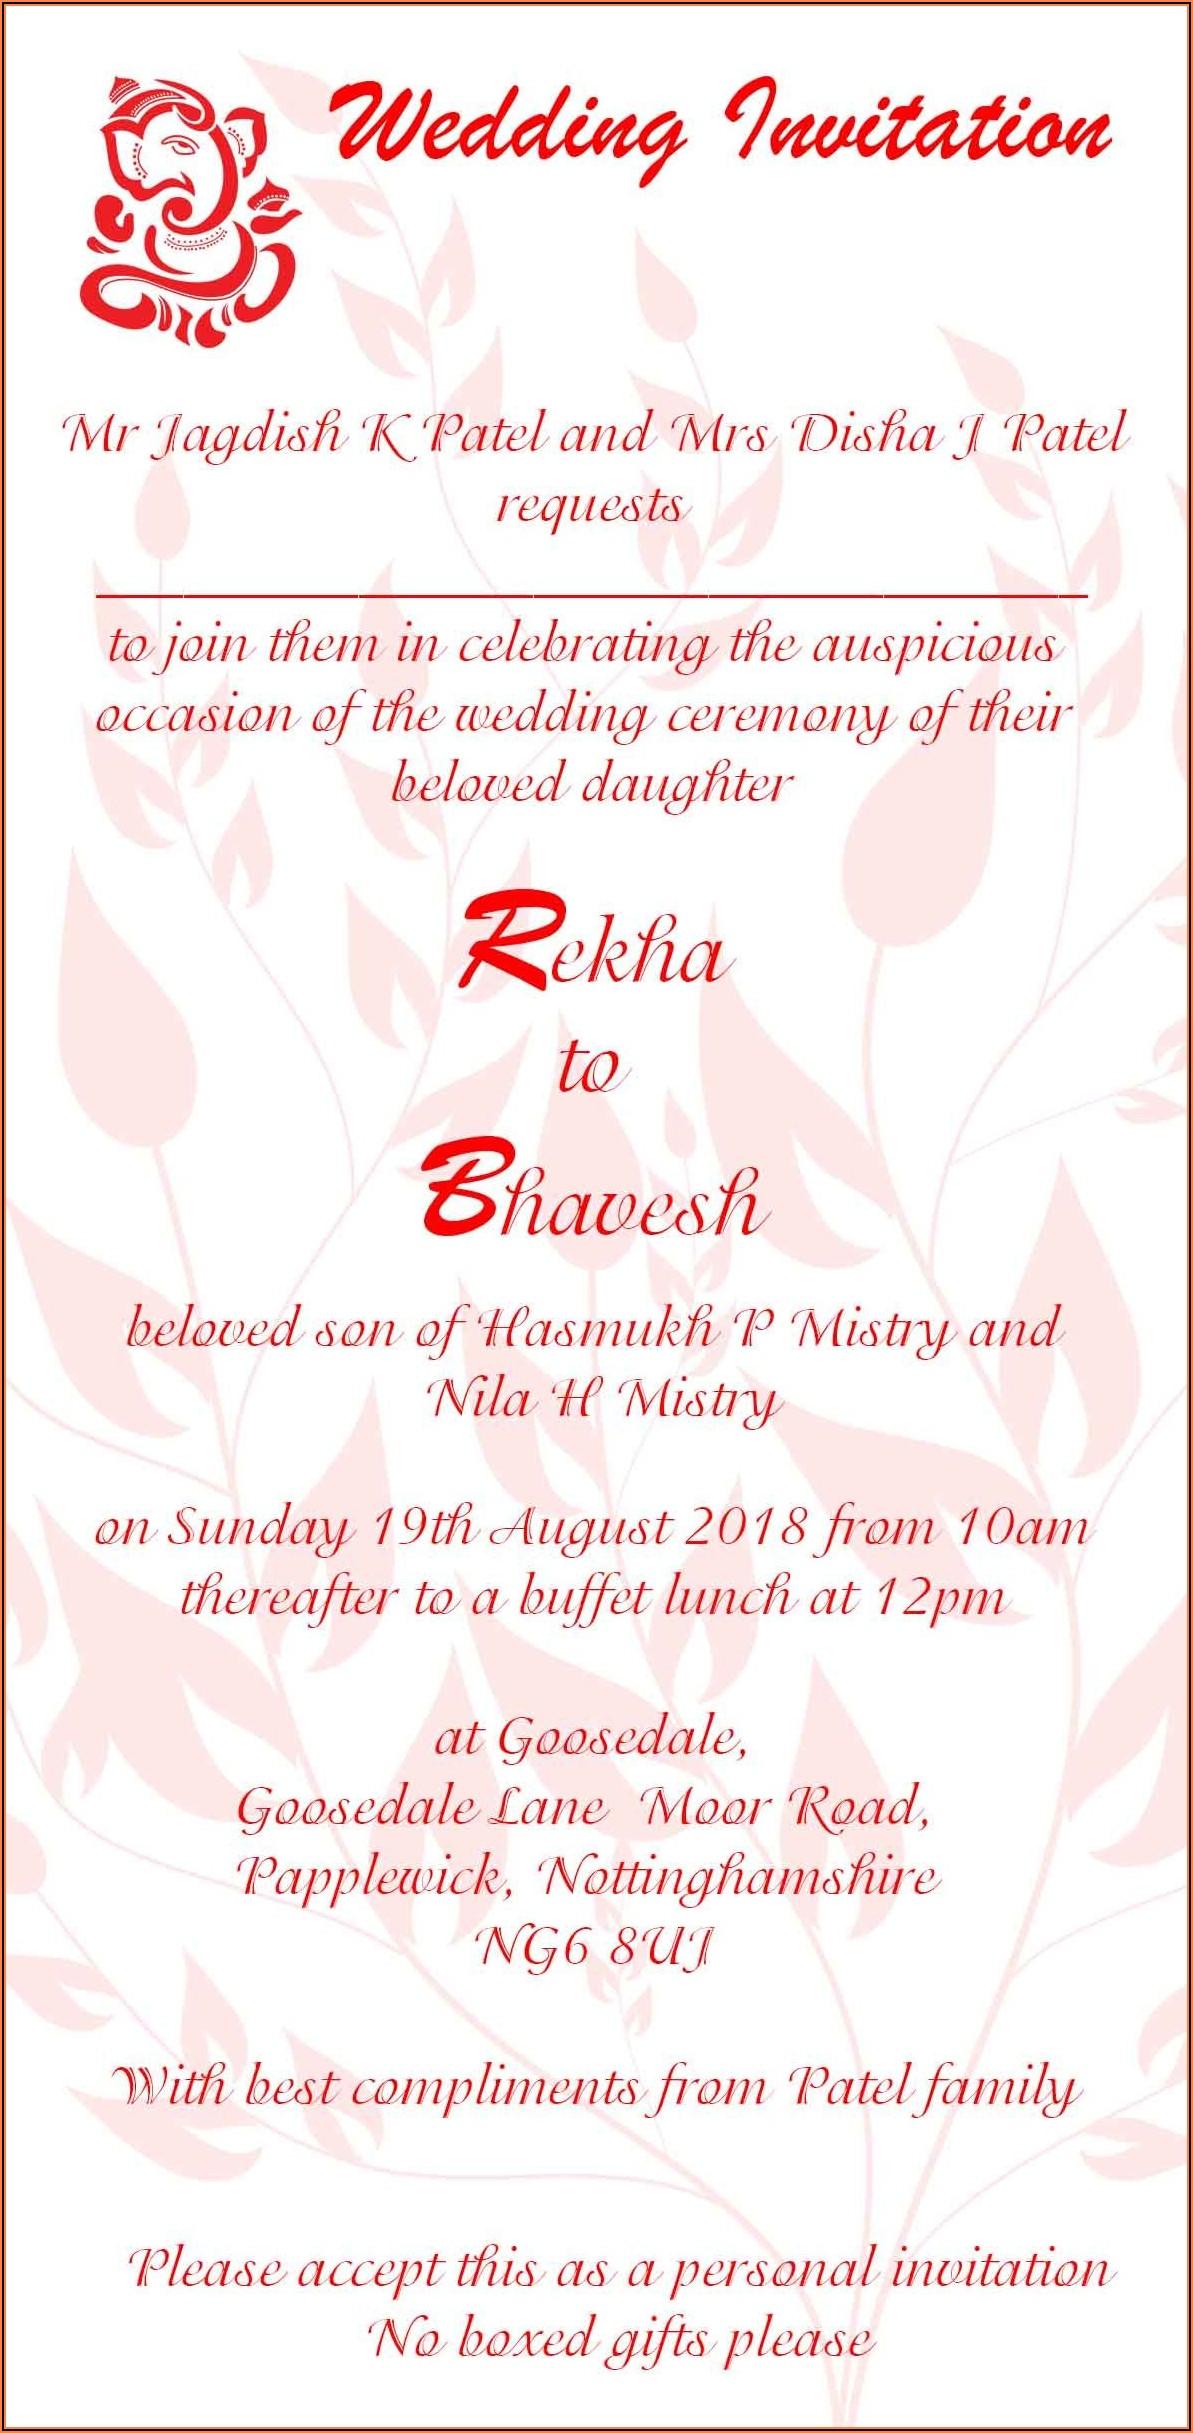 Wedding Invitation Wording Templates Indian